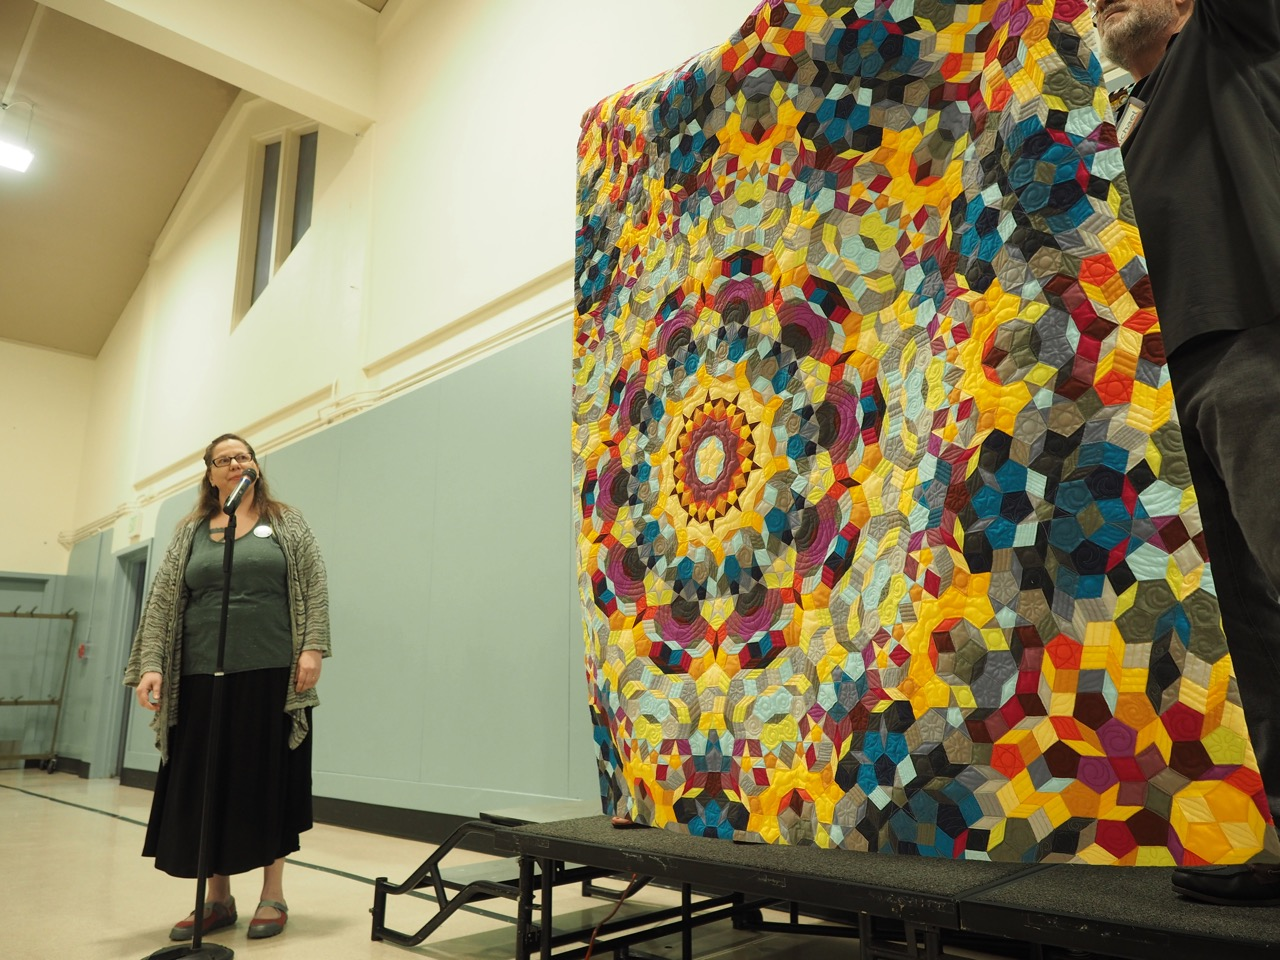 The Kaleidoscope Quilt by Gail Weiss